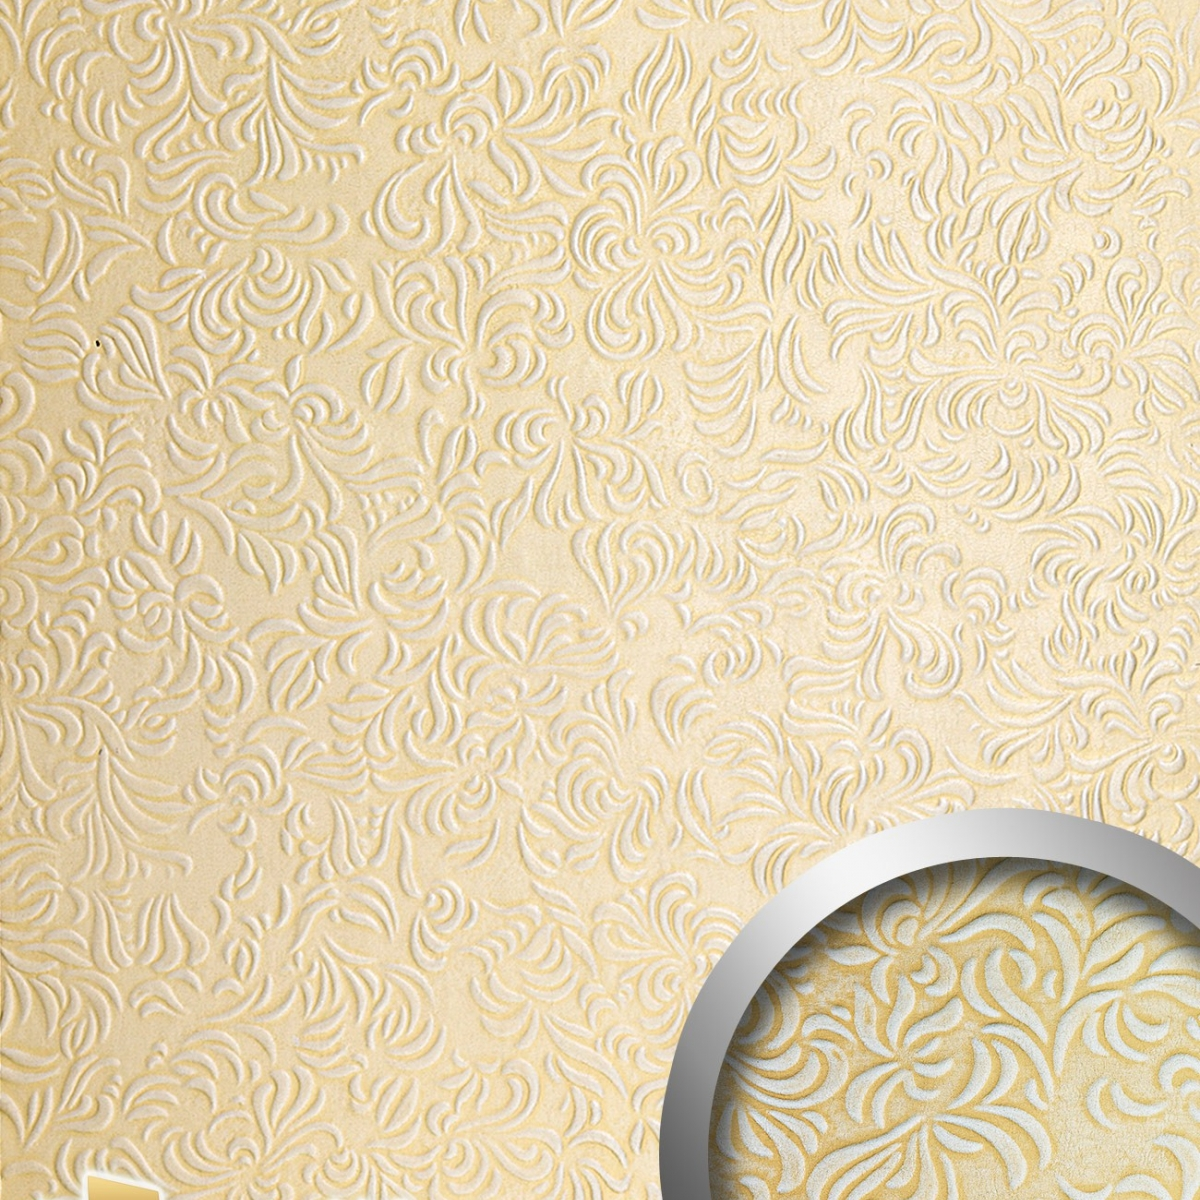 Panou decorativ LEATHER 17265, WallFace, autocolant